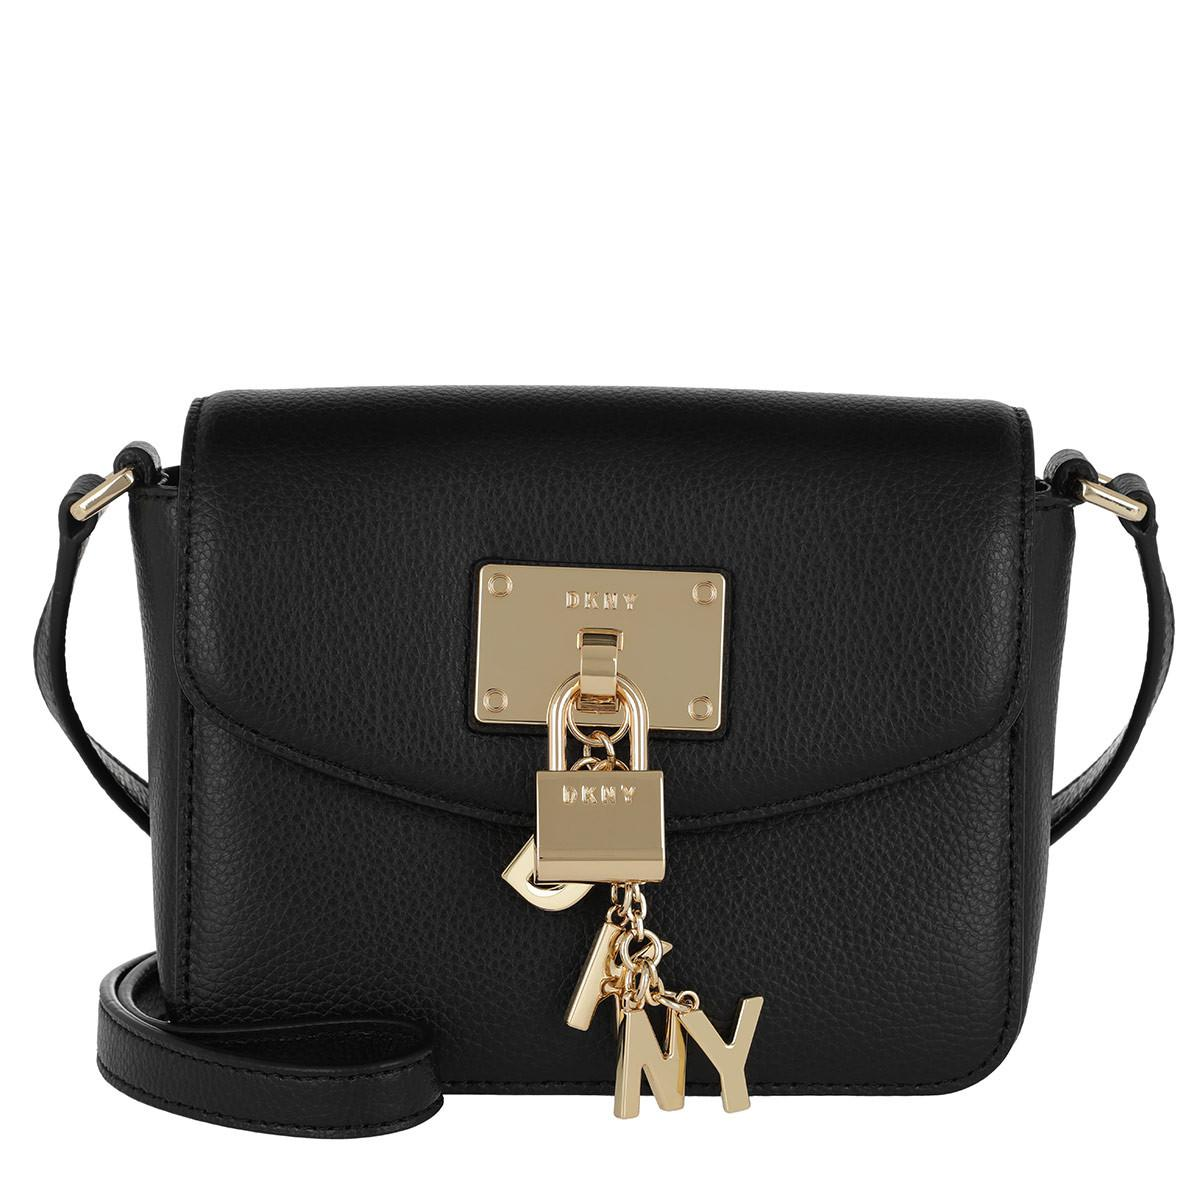 Cross Body Bags - Ann SM Shoulder Bag Black/Gold - black - Cross Body Bags for ladies DKNY GkVog